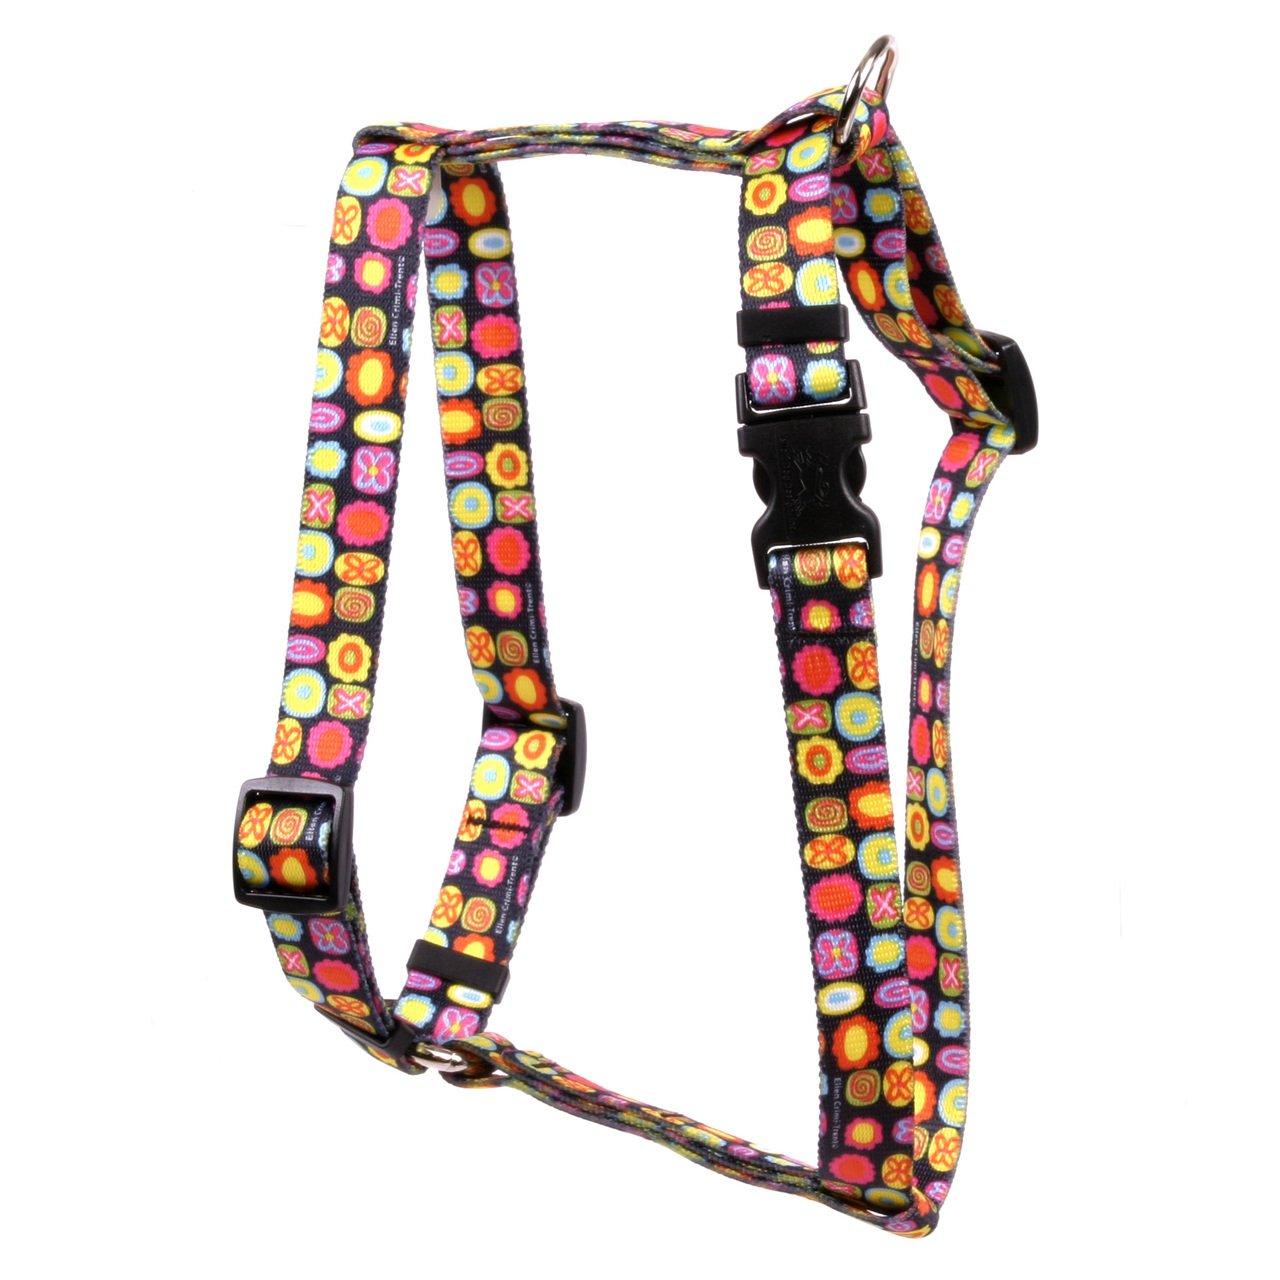 Large 20\ Yellow Dog Design Bright Fun Roman Style H Dog Harness, Large